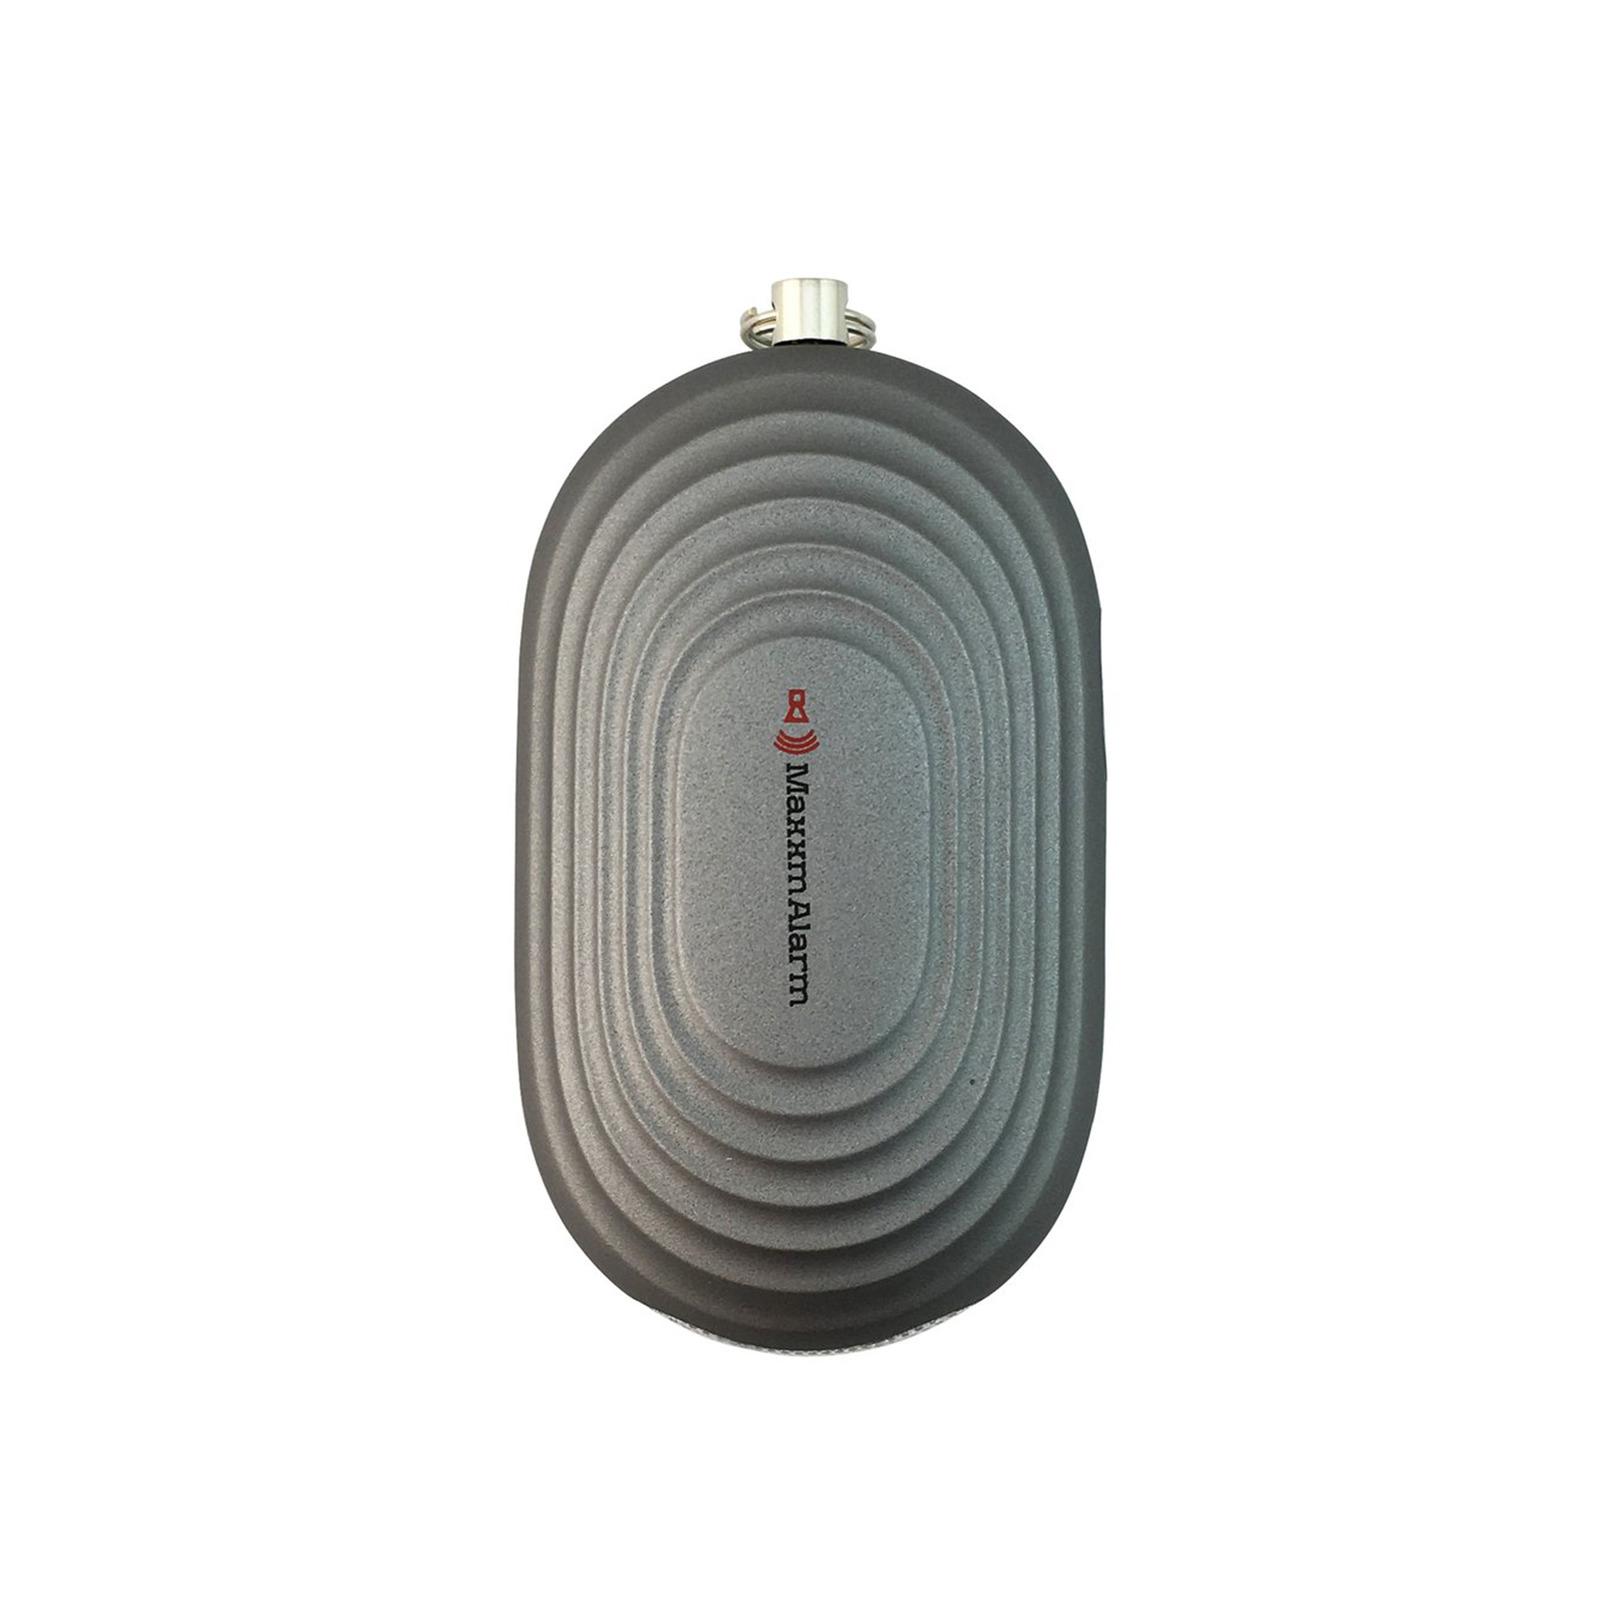 iMaxAlarm Portable Personal Alarm With Light (Matte Grey)